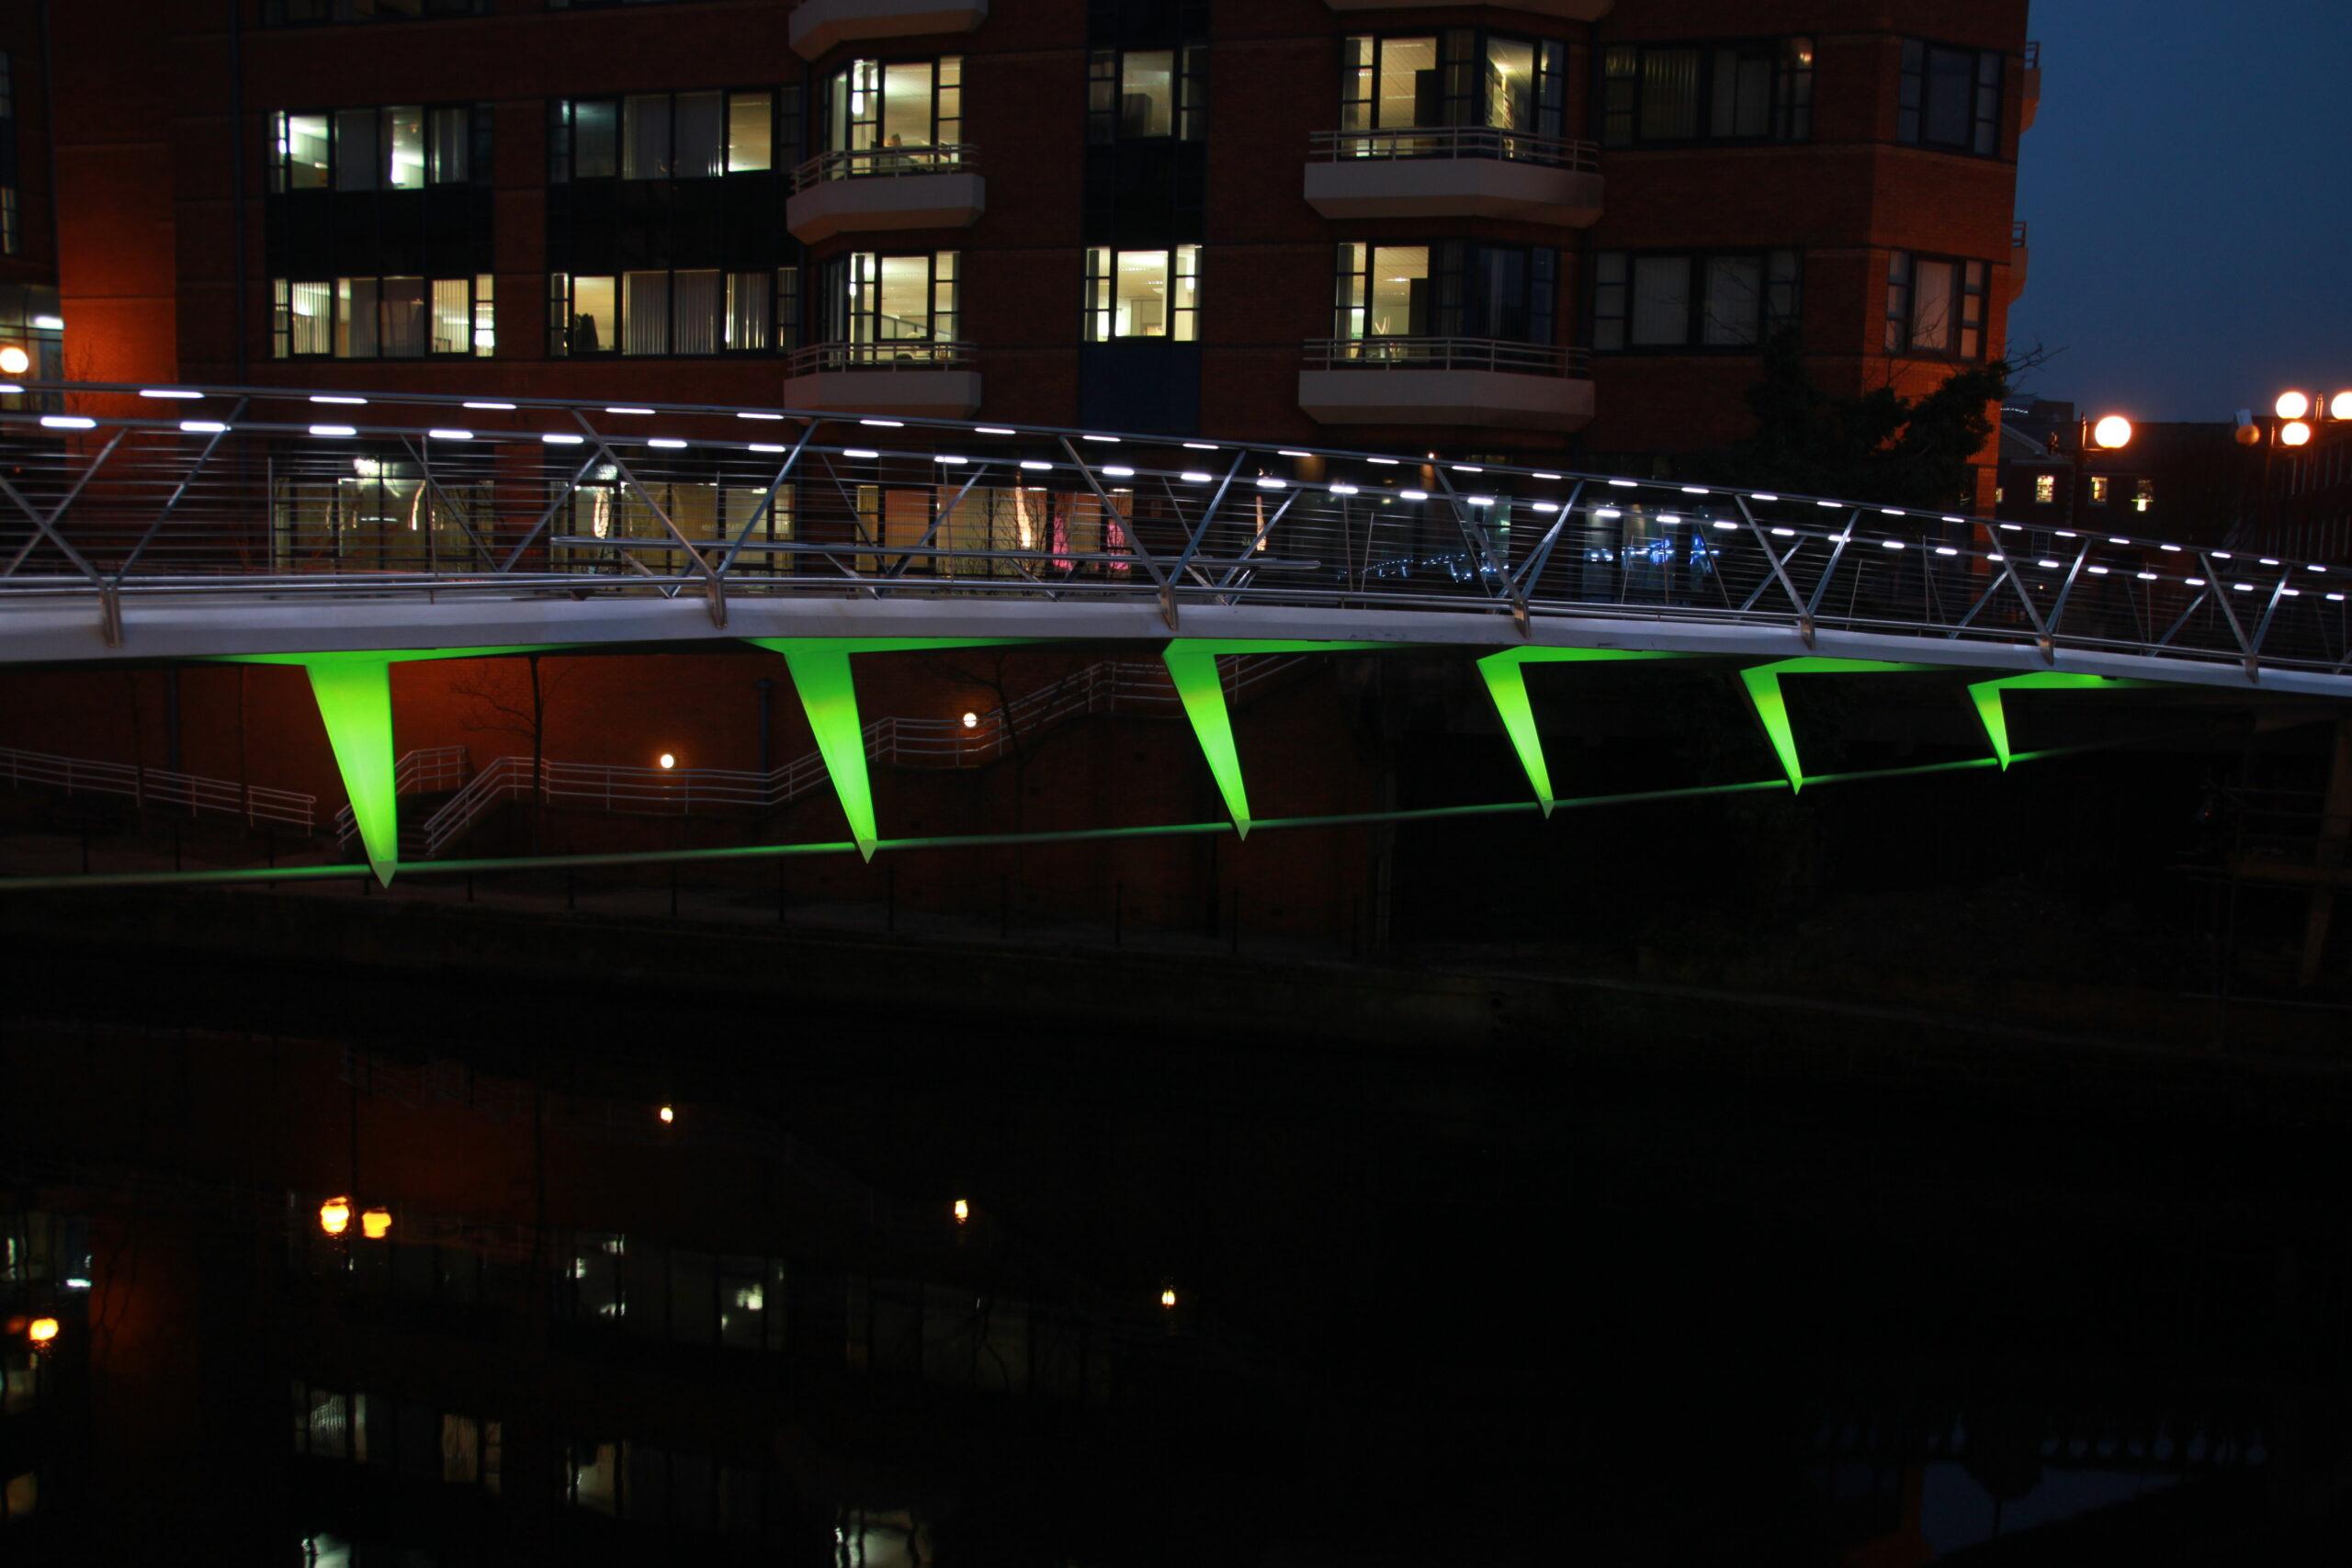 Irwell Footbridge Handrail Lighting - Architectural Lighting for Bridges & Walkways